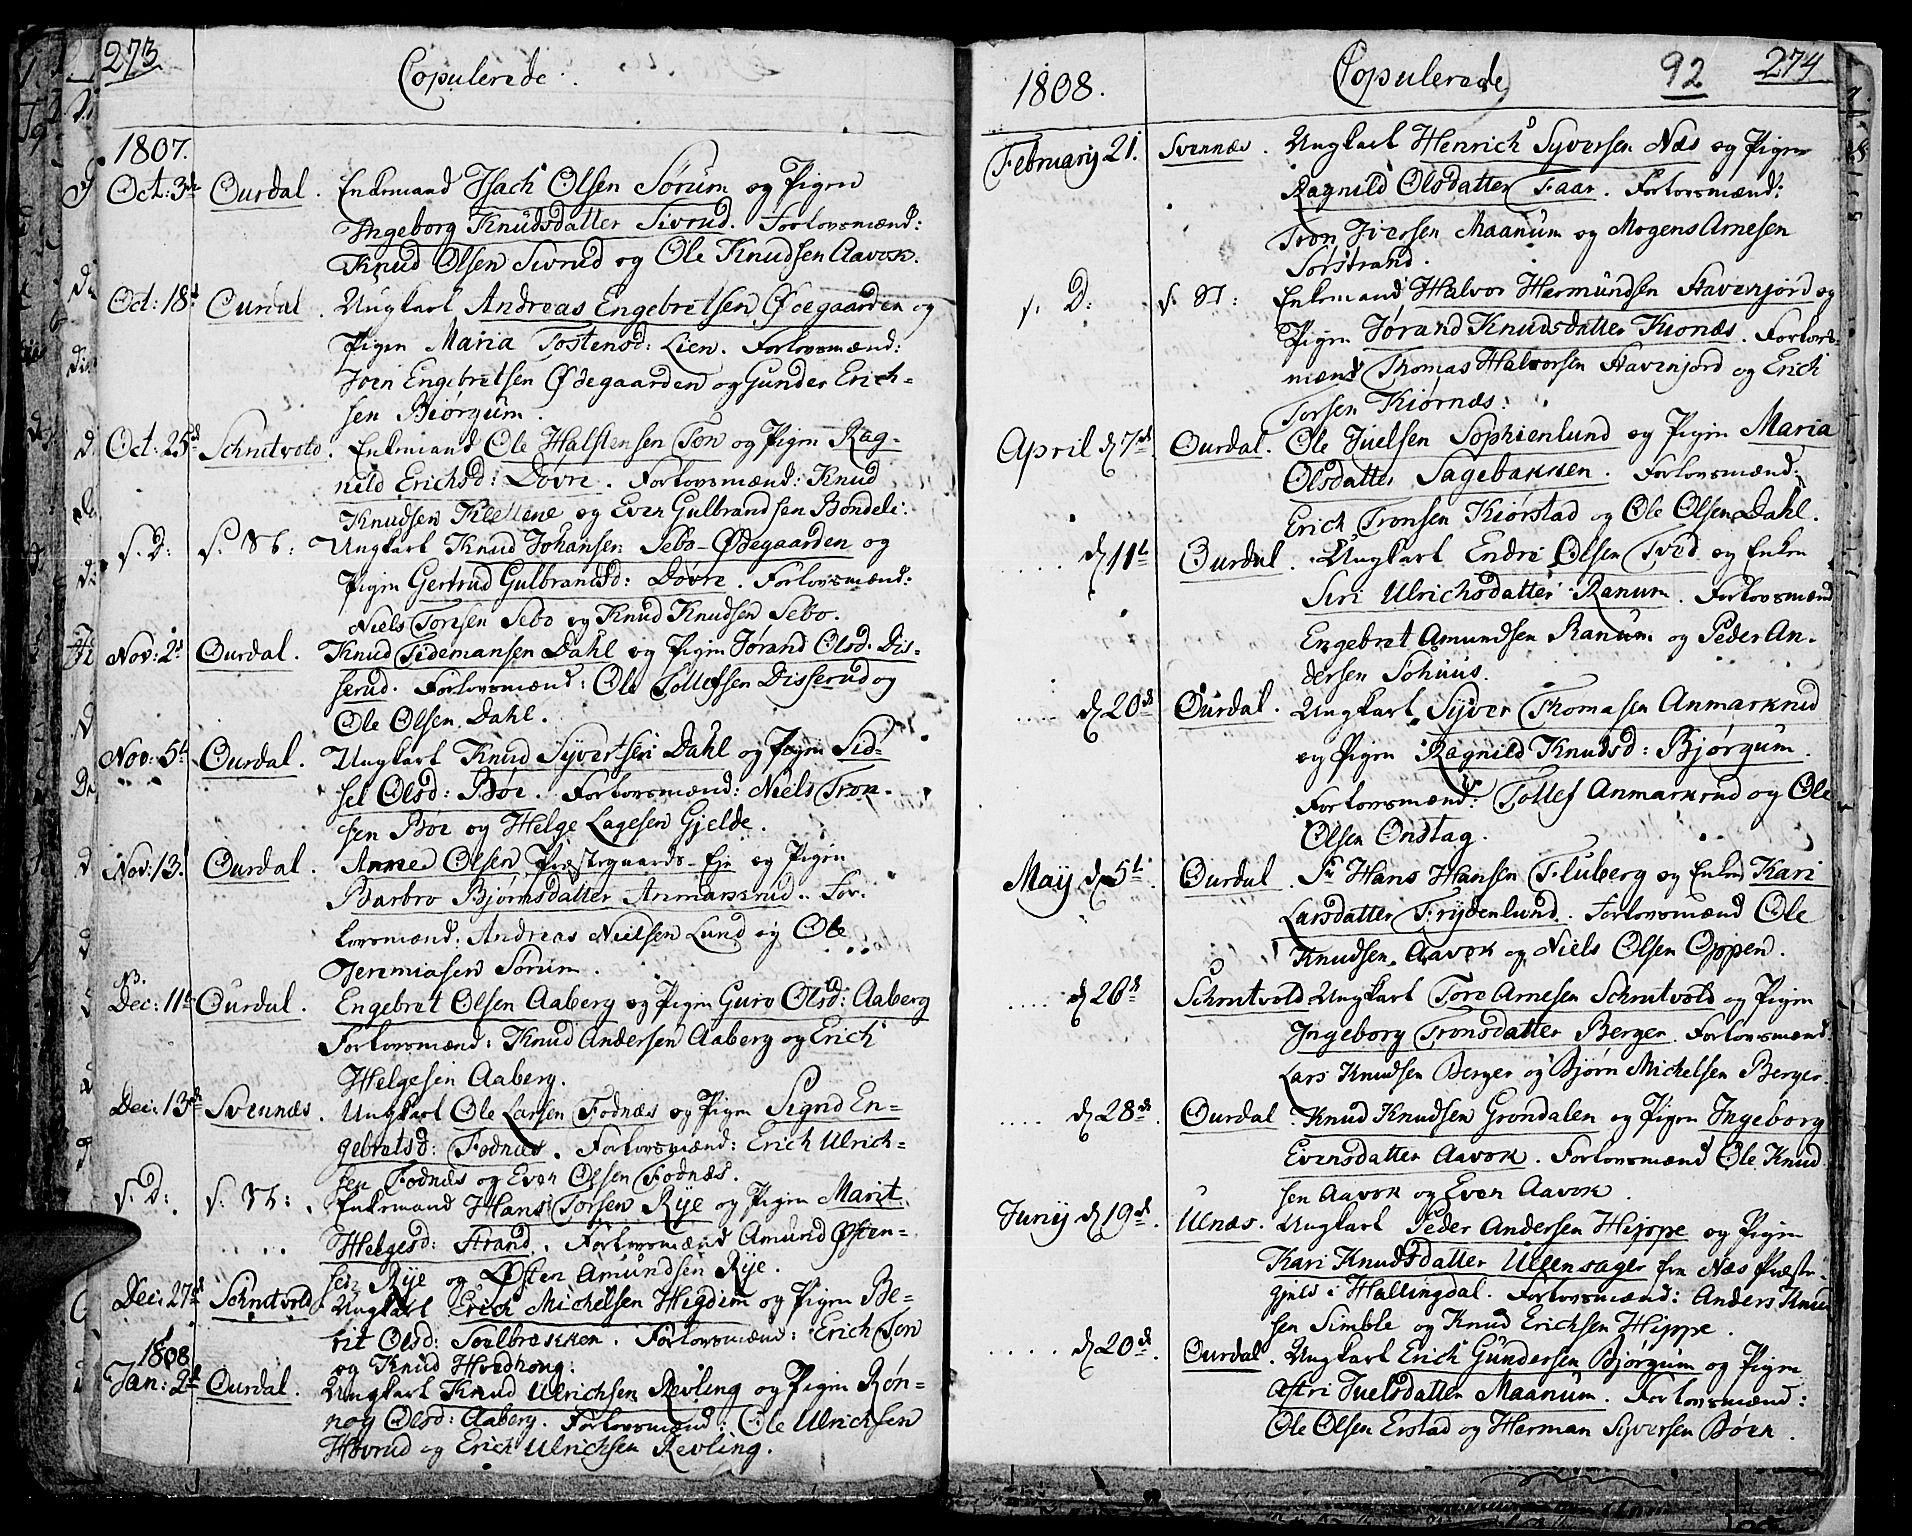 SAH, Aurdal prestekontor, Ministerialbok nr. 7, 1800-1808, s. 92